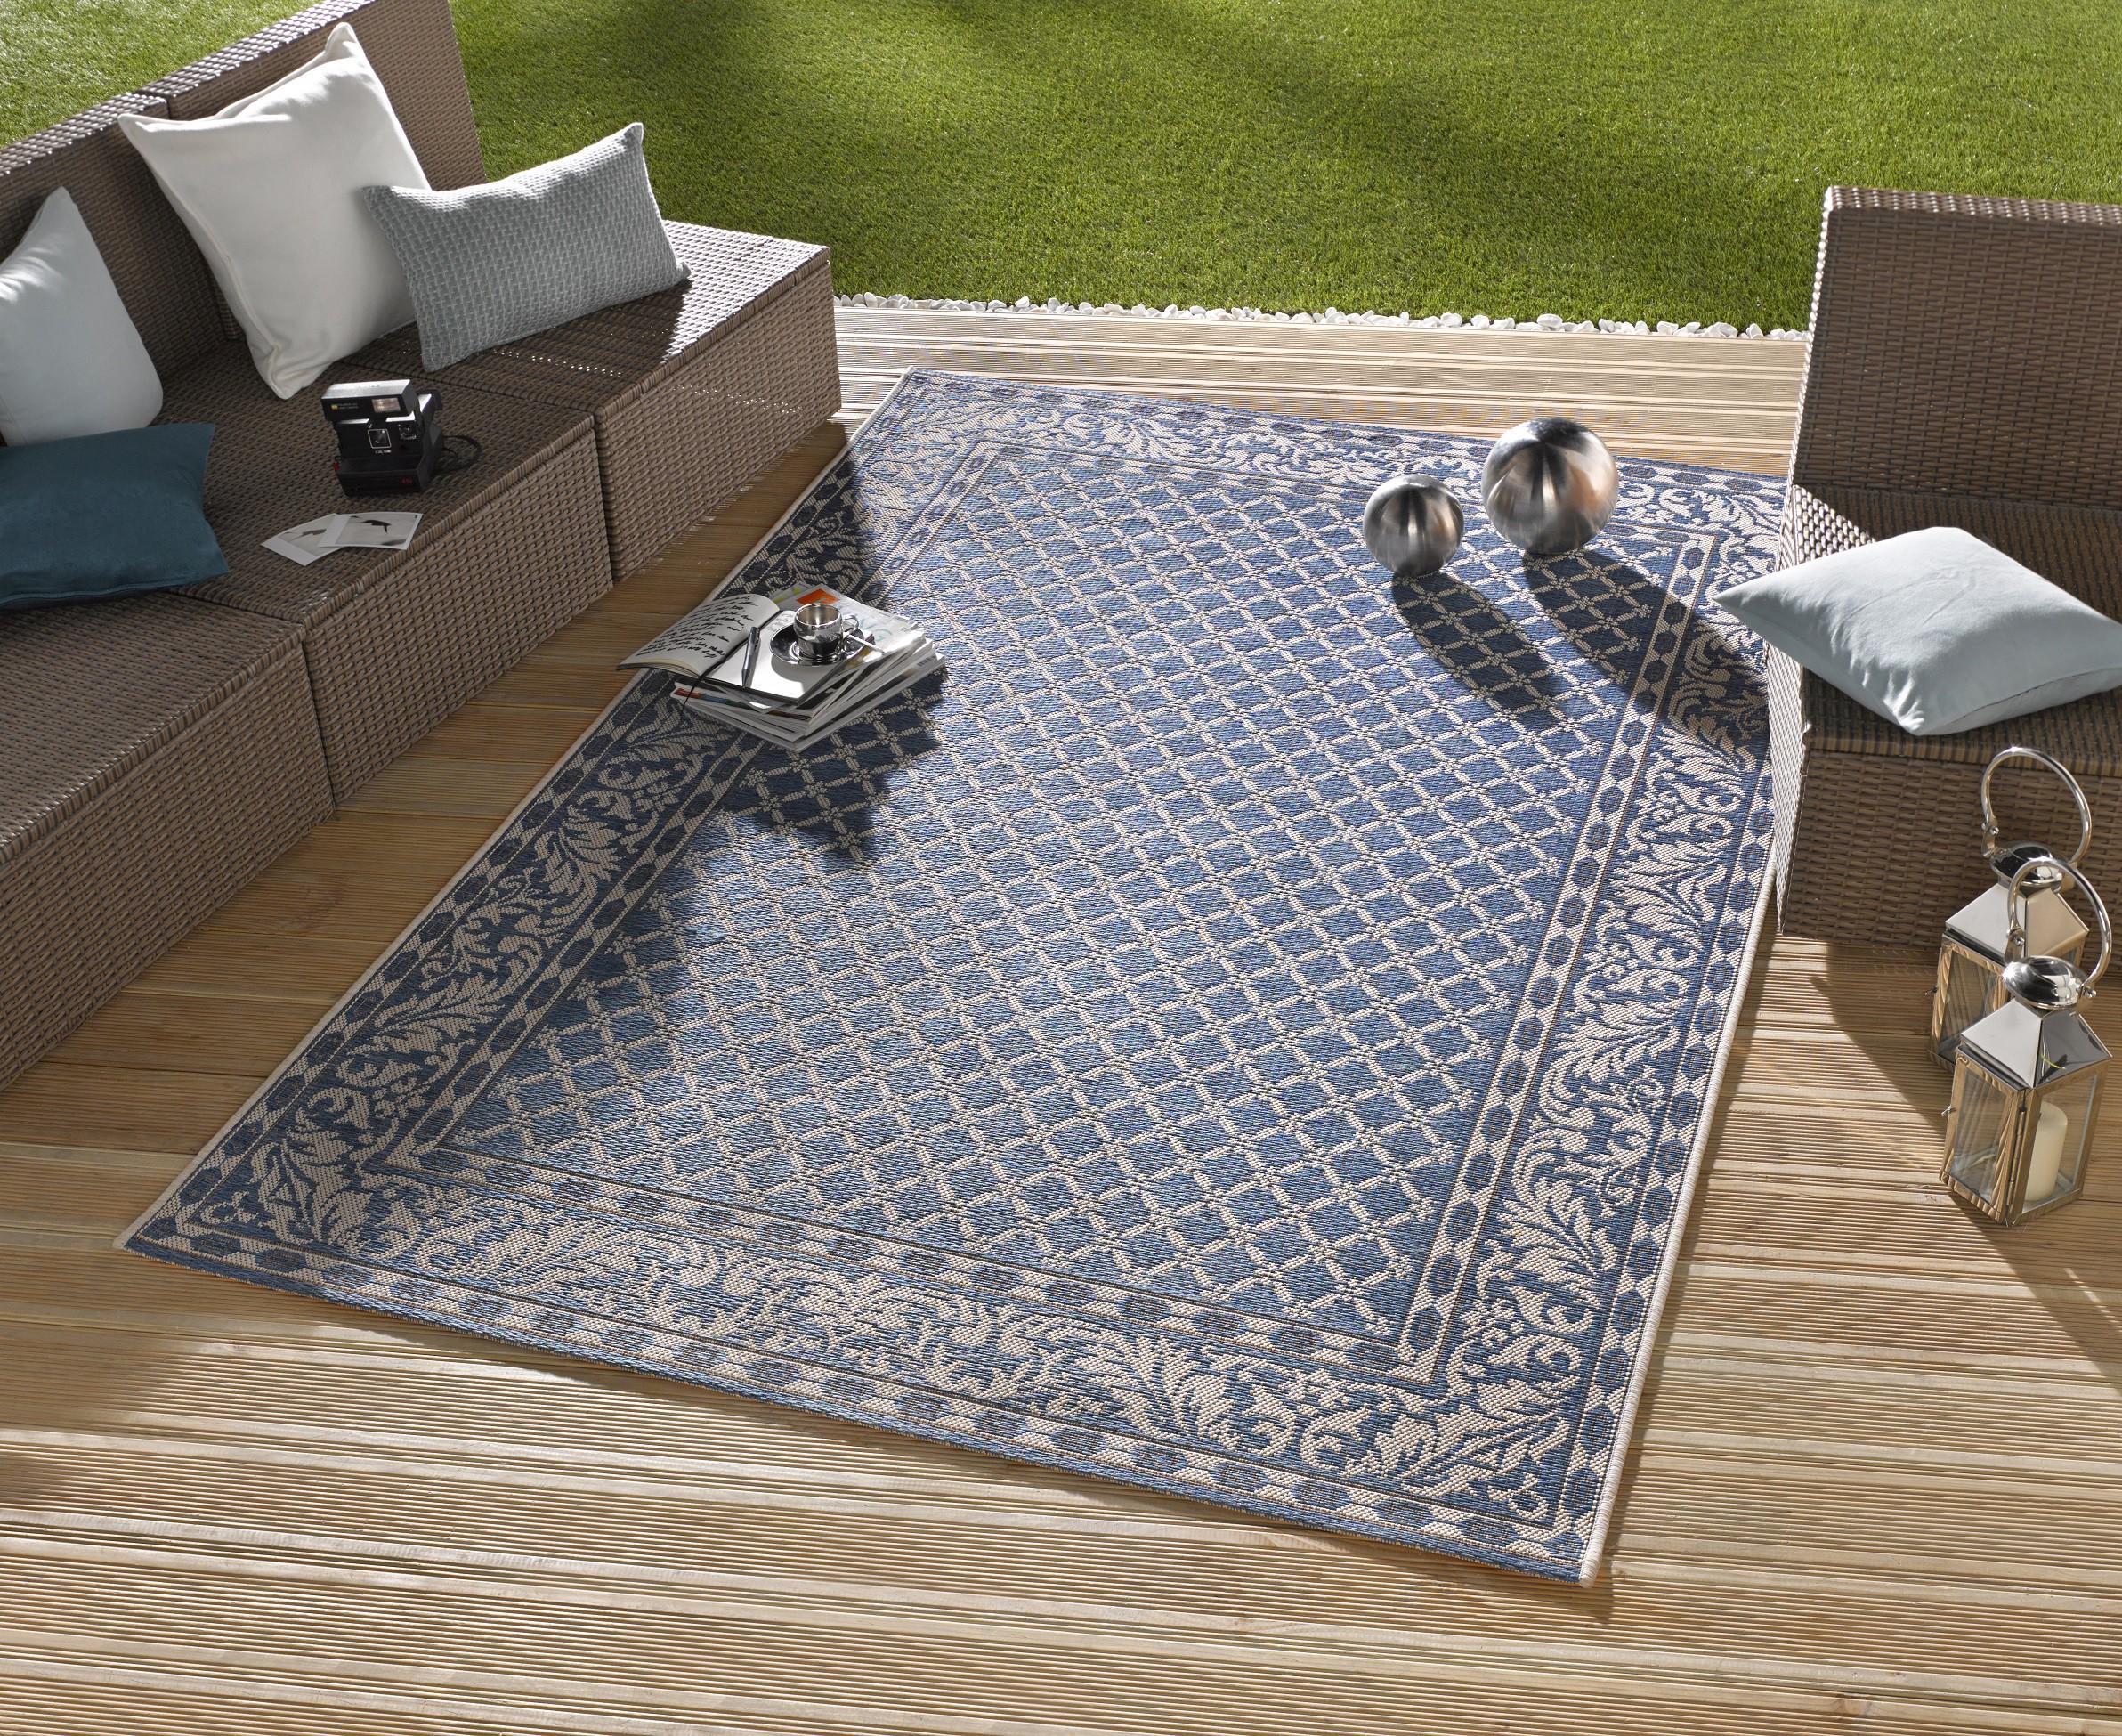 in outdoor design teppich terrasse wintergarten 160 x 230 cm royal blau od 1 teppiche design. Black Bedroom Furniture Sets. Home Design Ideas